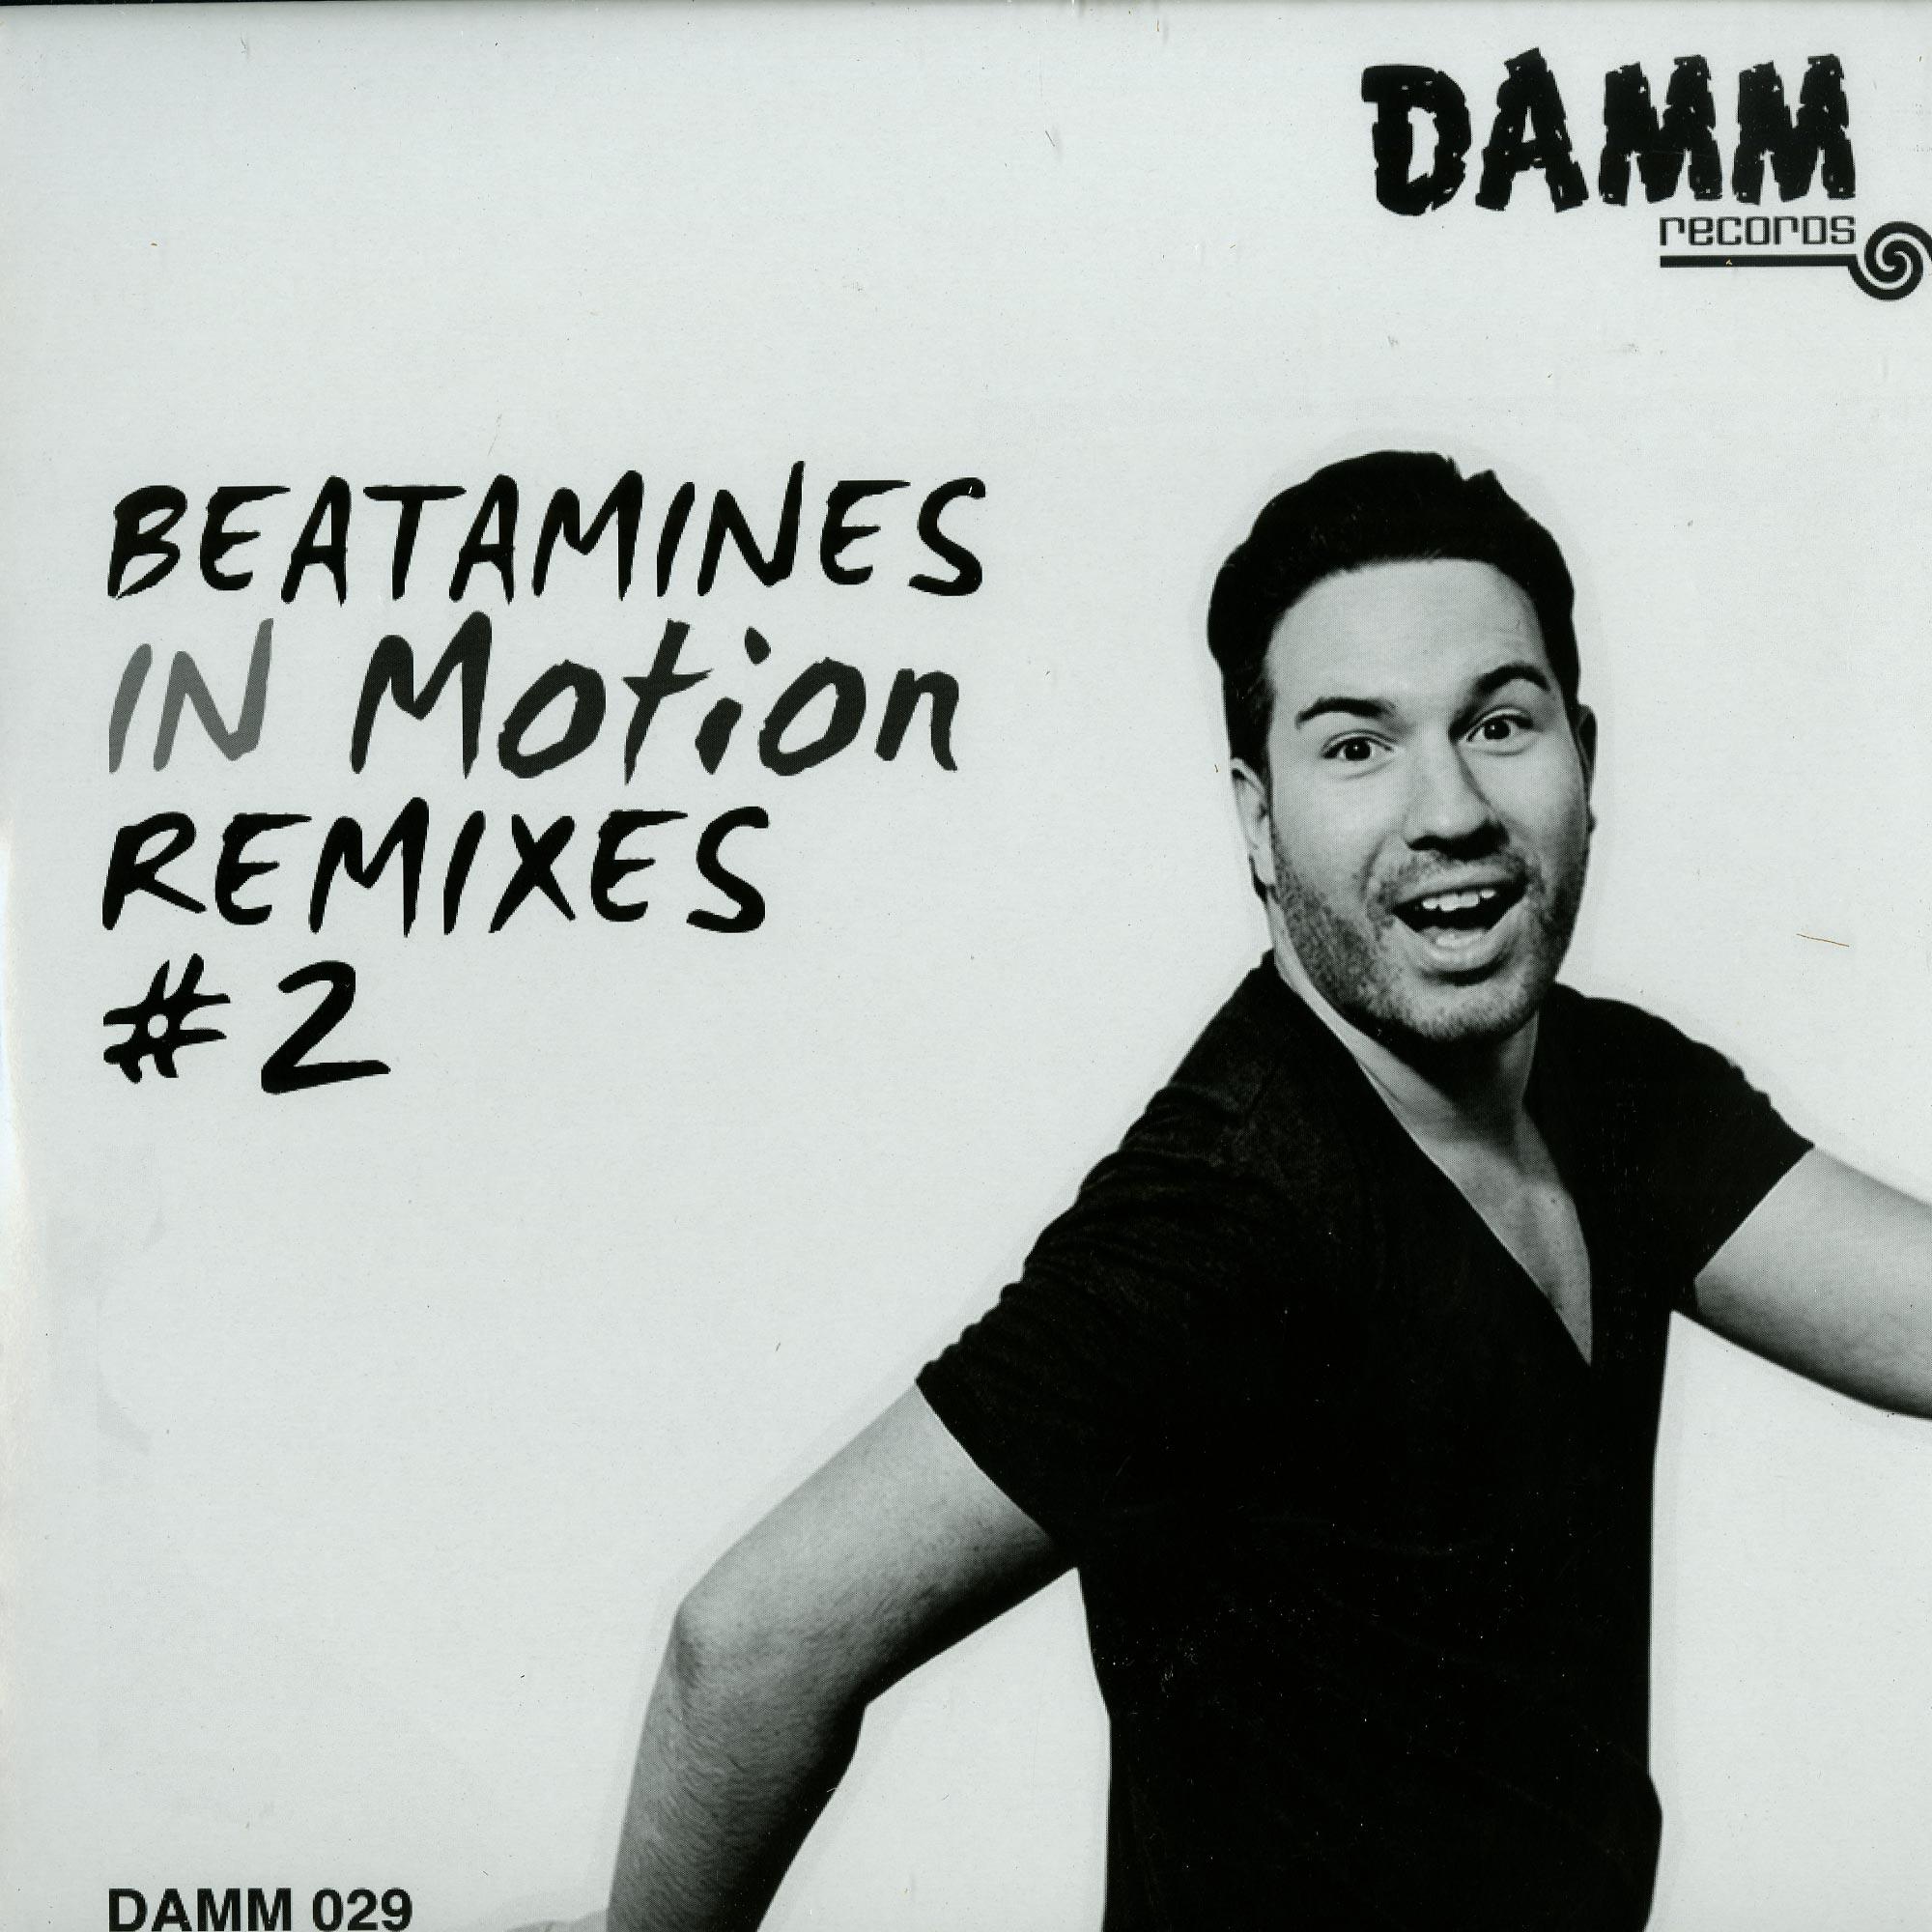 Beatamines - IN MOTION REMIXES 2